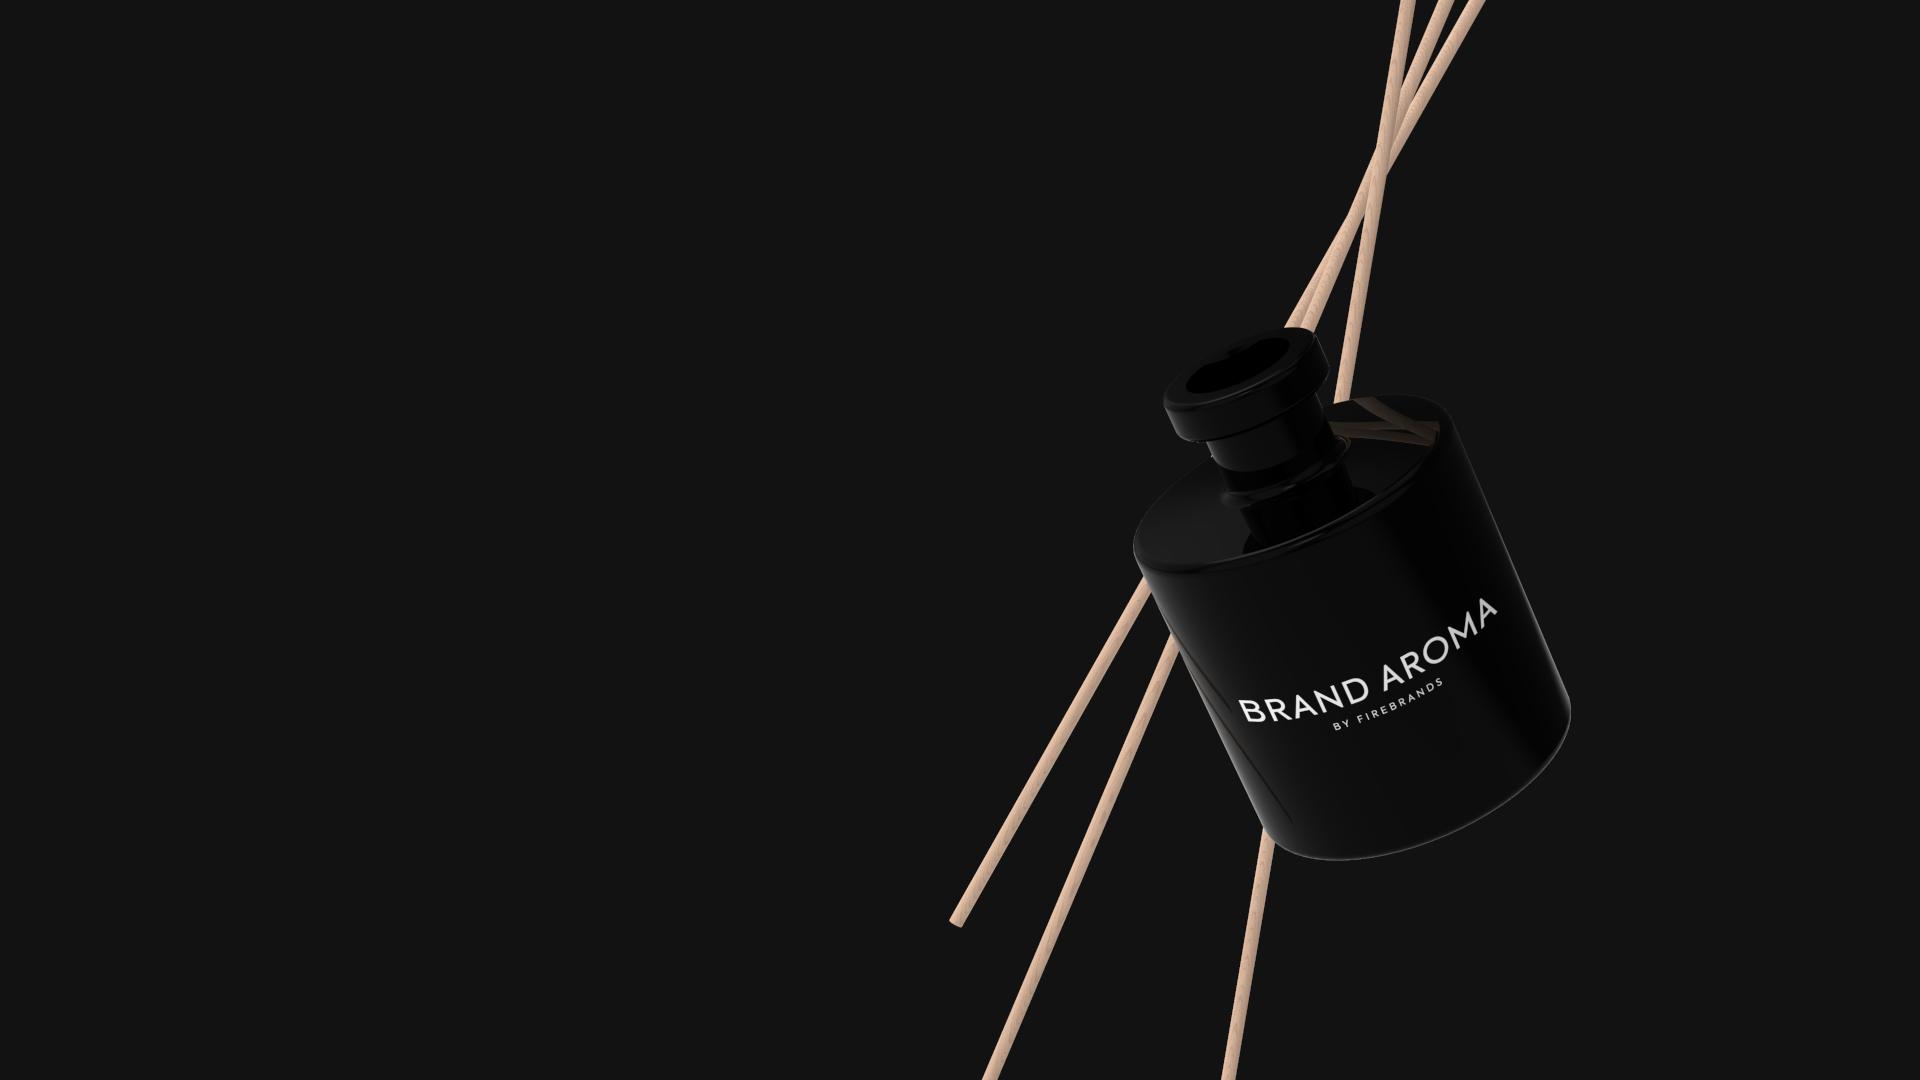 Aroma Mini 3